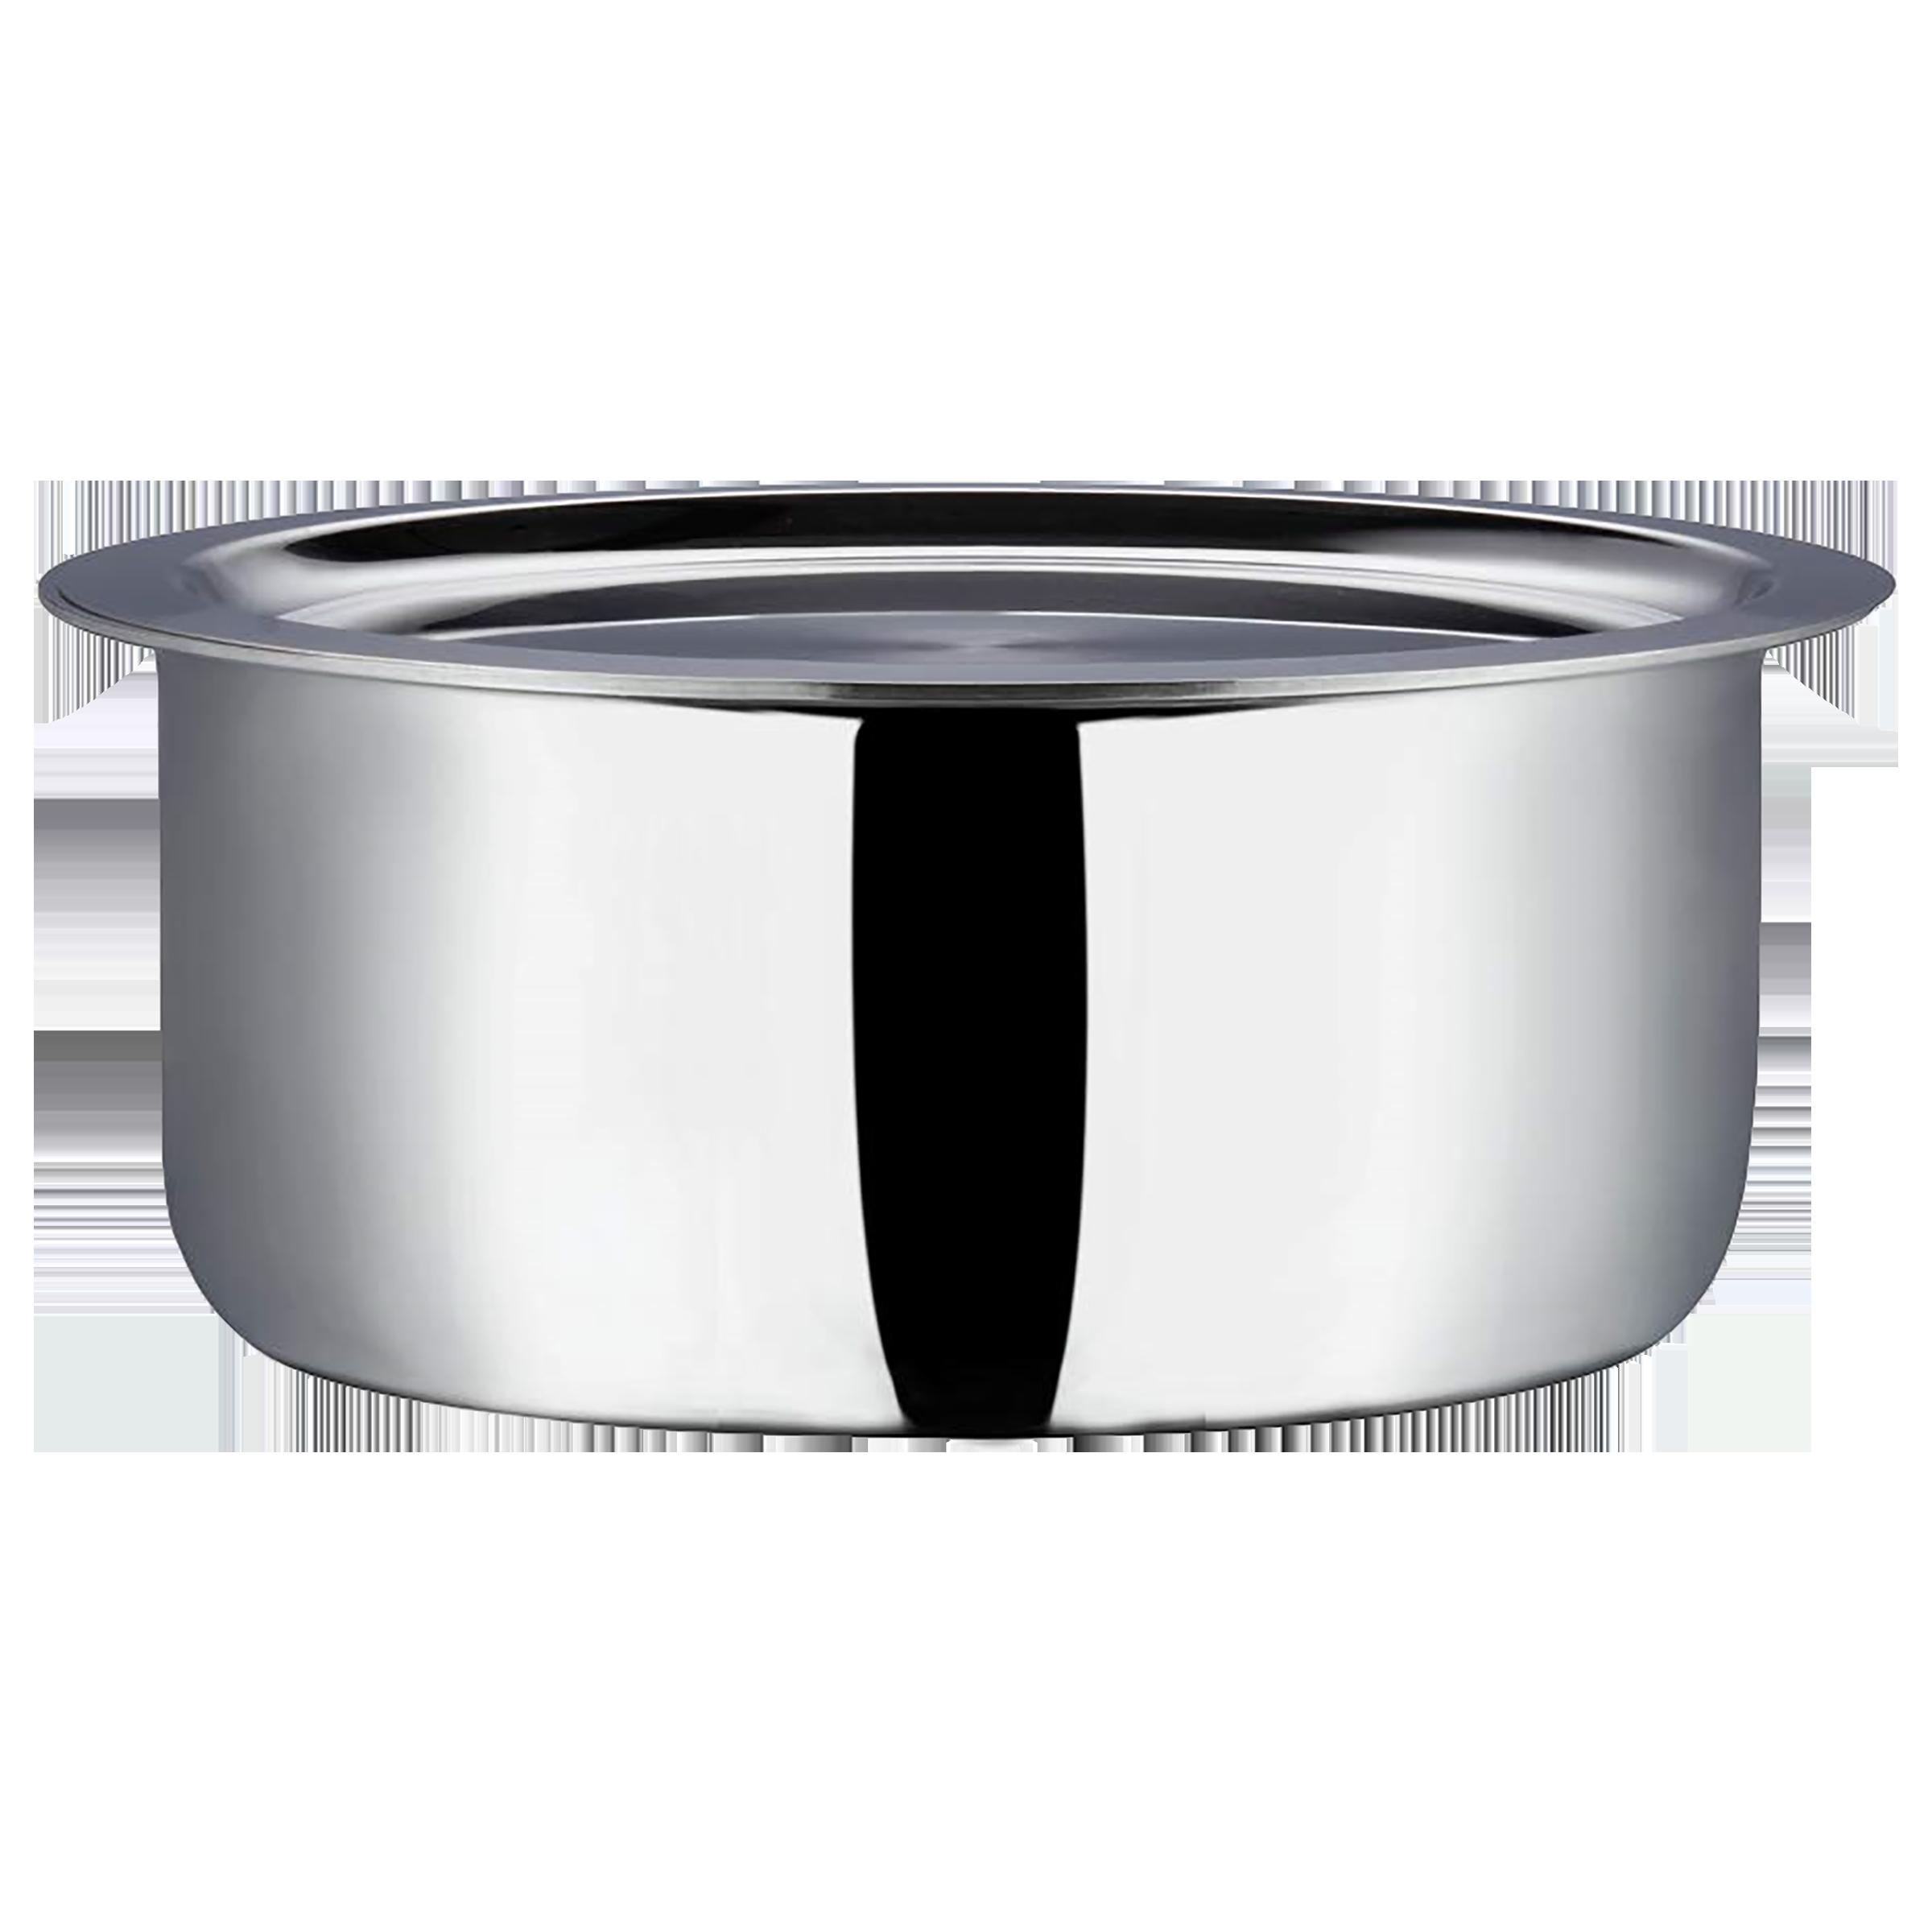 Vinod Cooking Pot (18/8 Stainless Steel Inside, PT22, Grey)_1